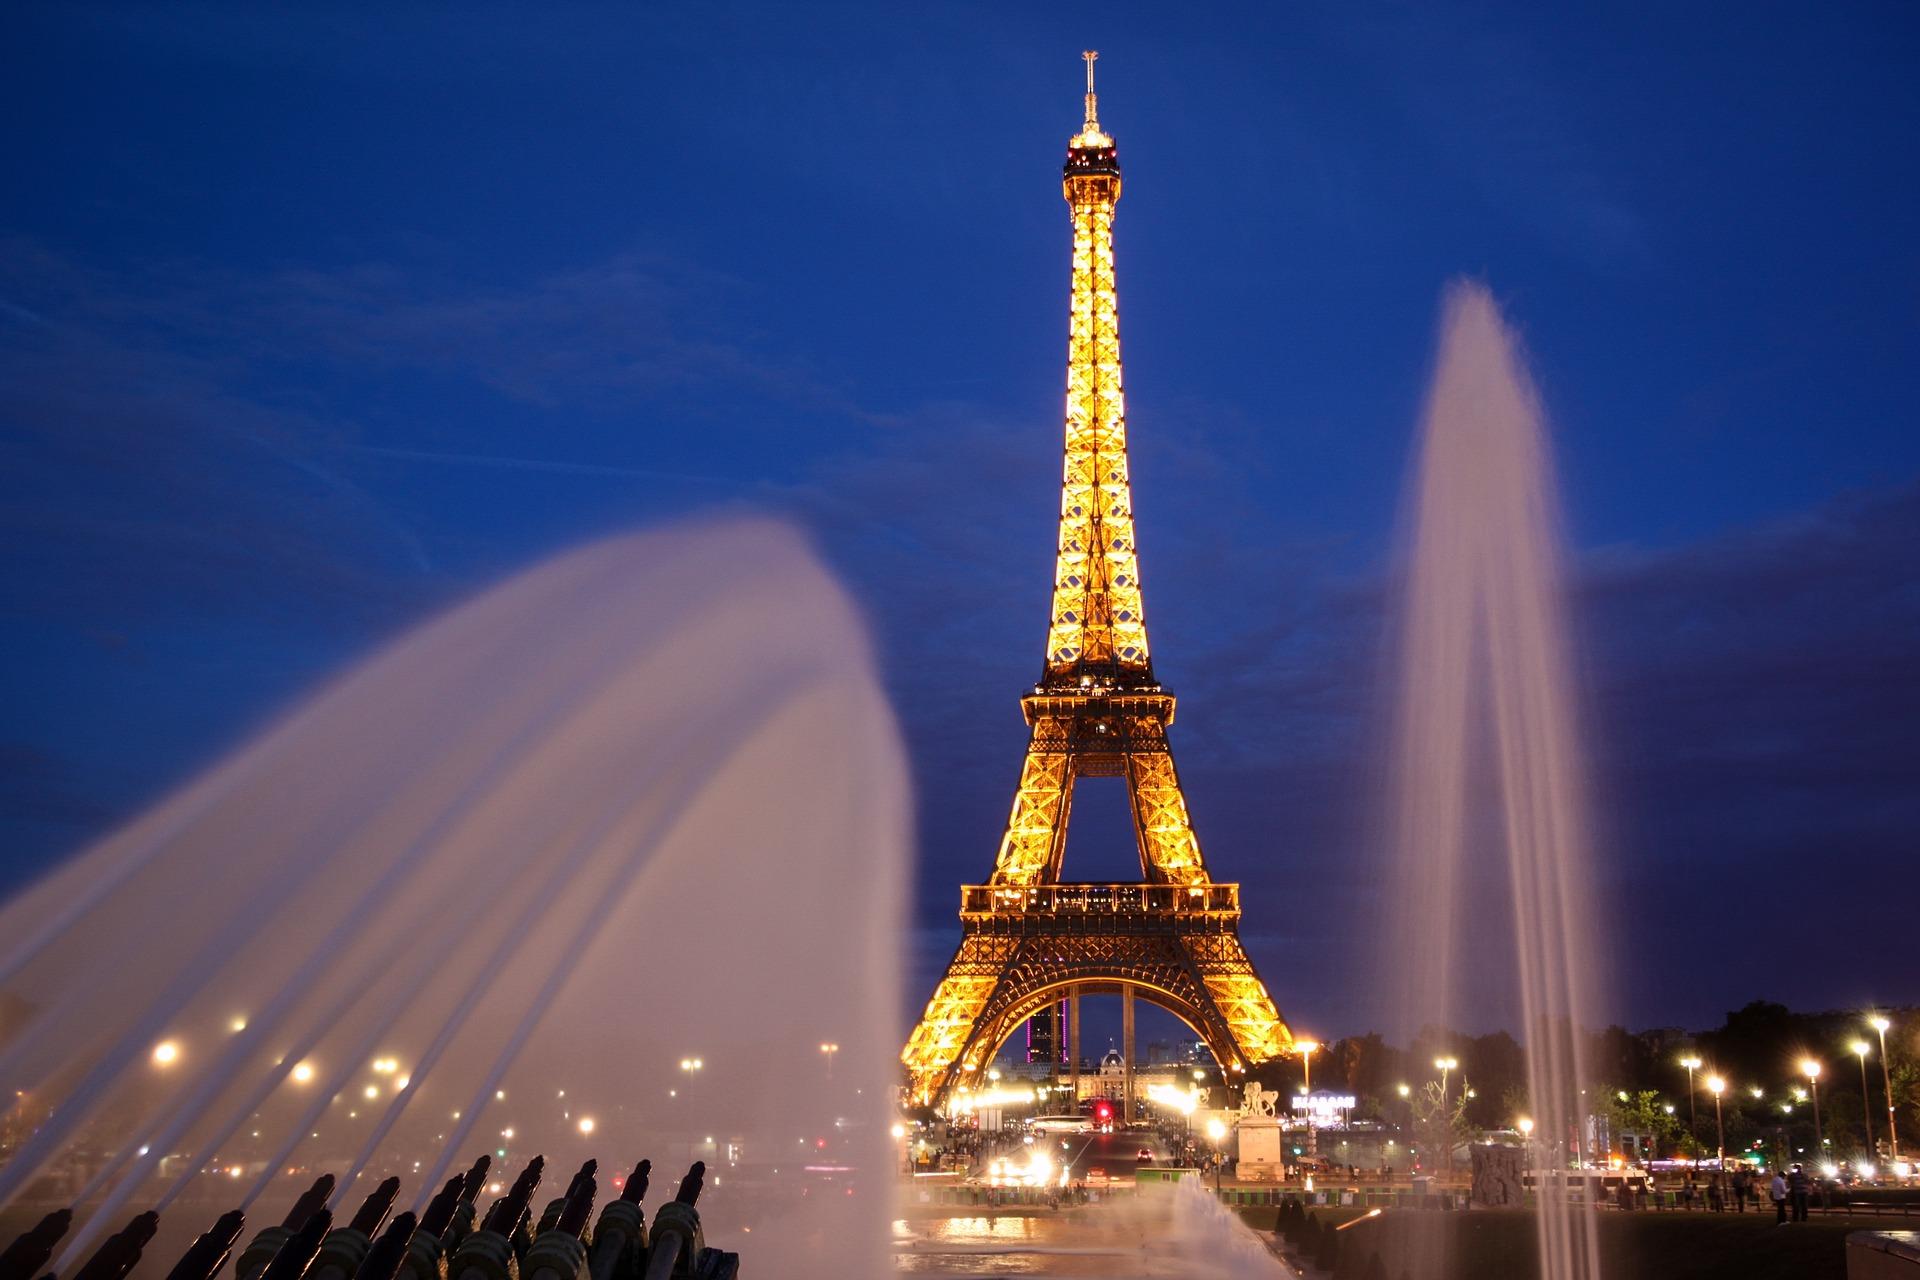 Eiffel Tower, Paris, France at night